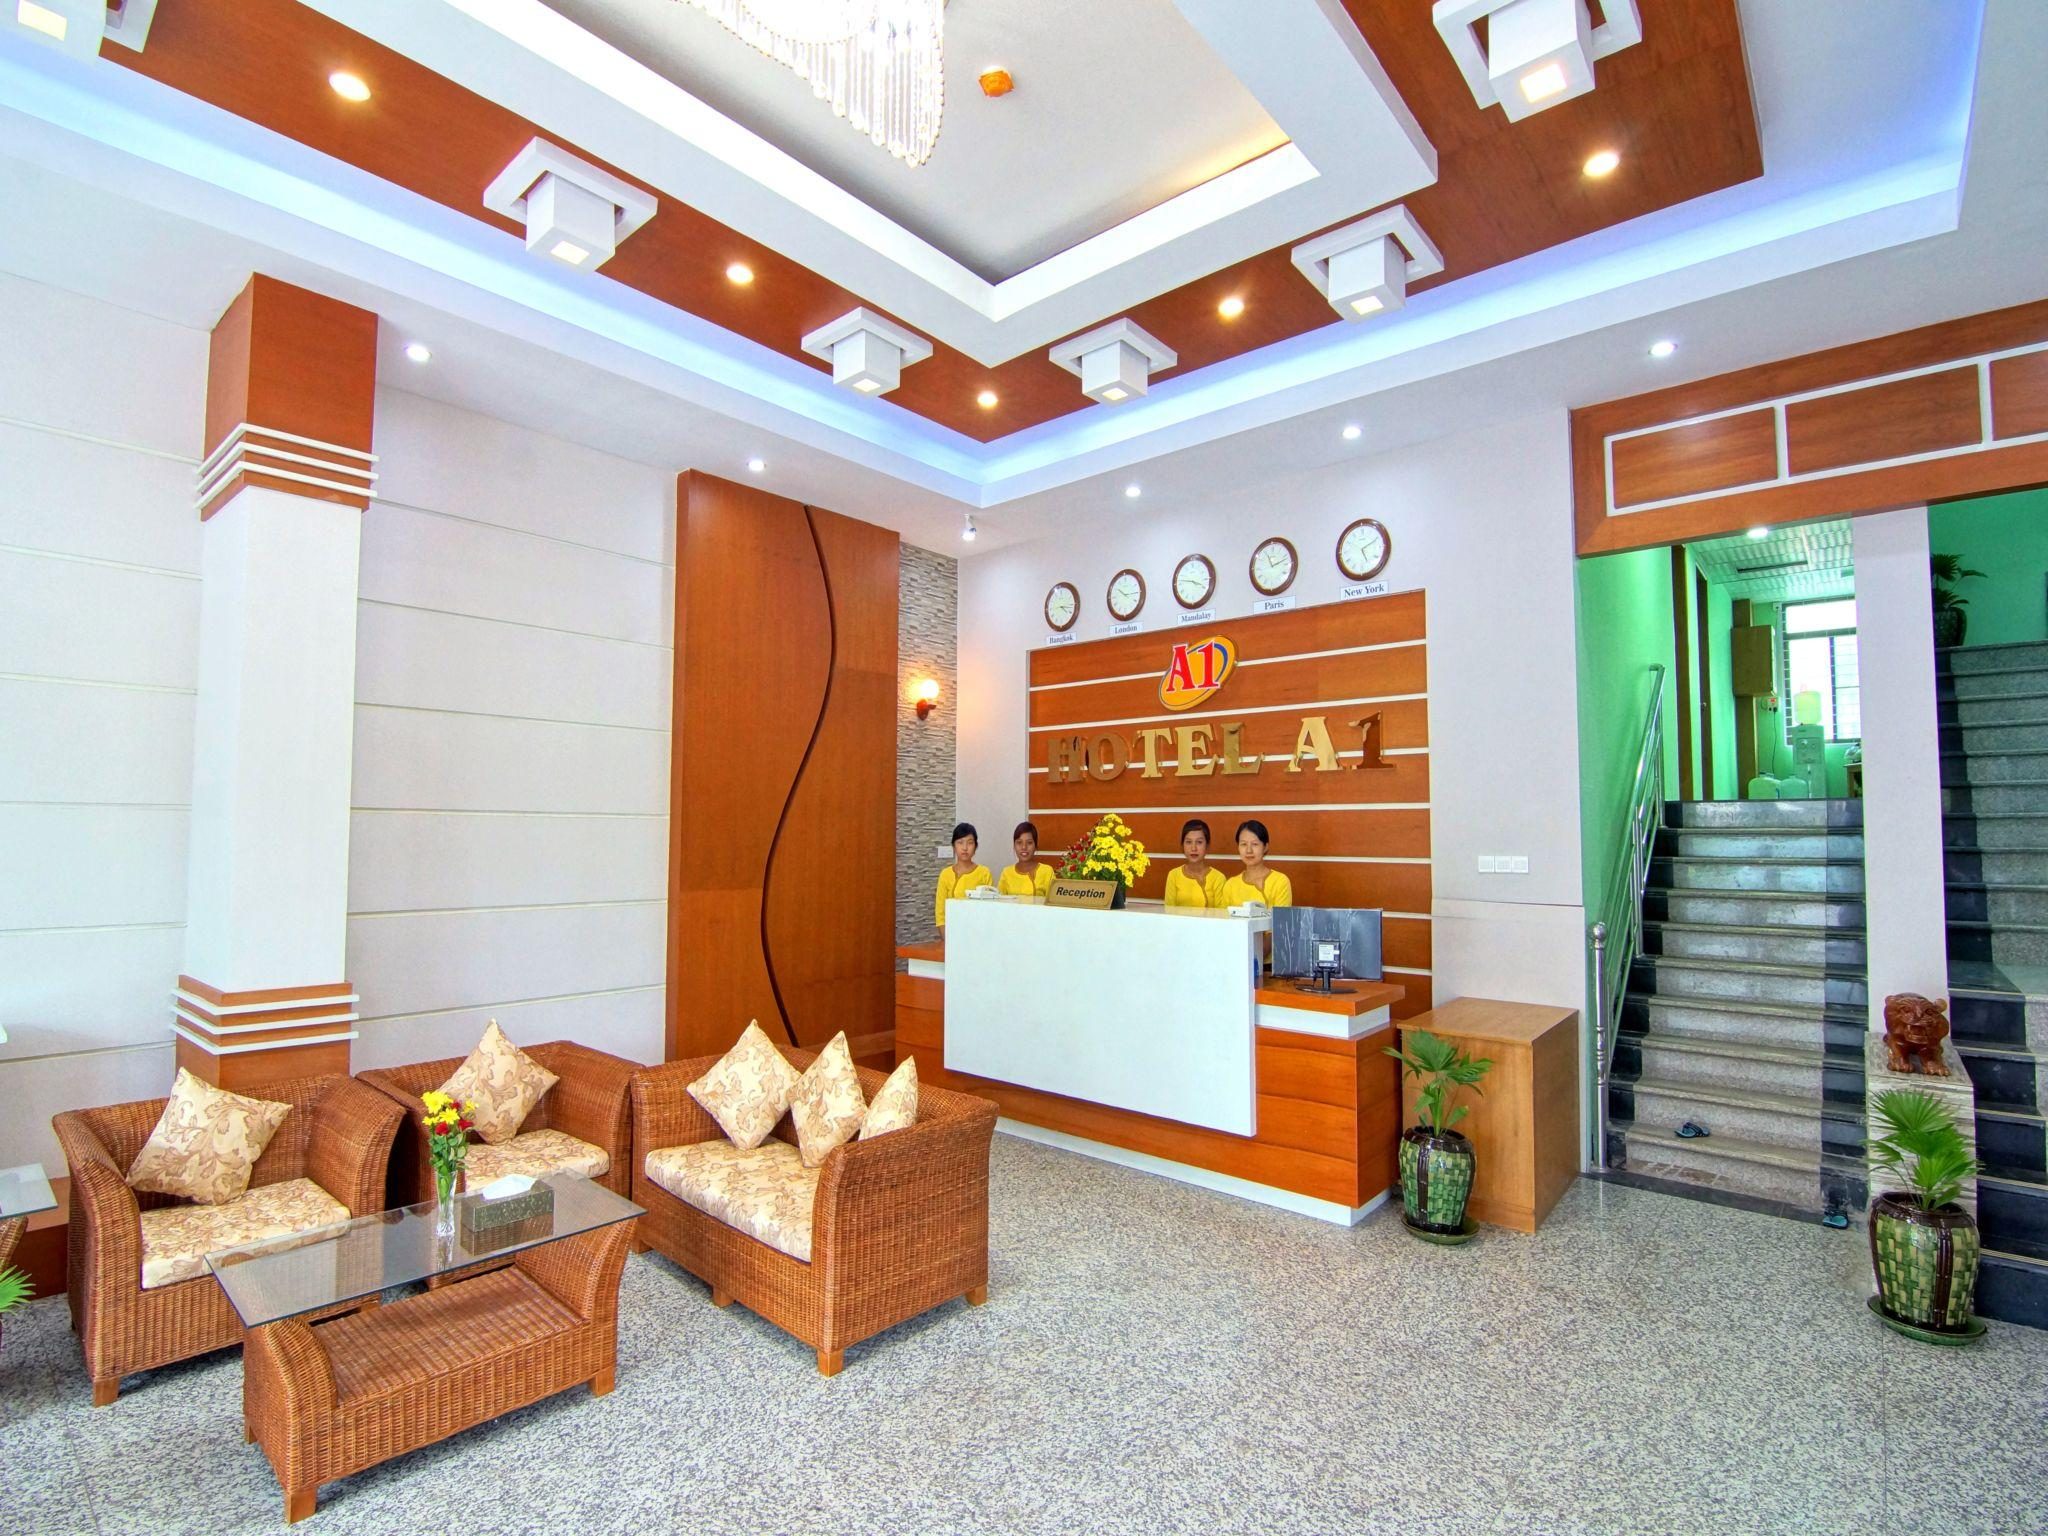 Hotel A1